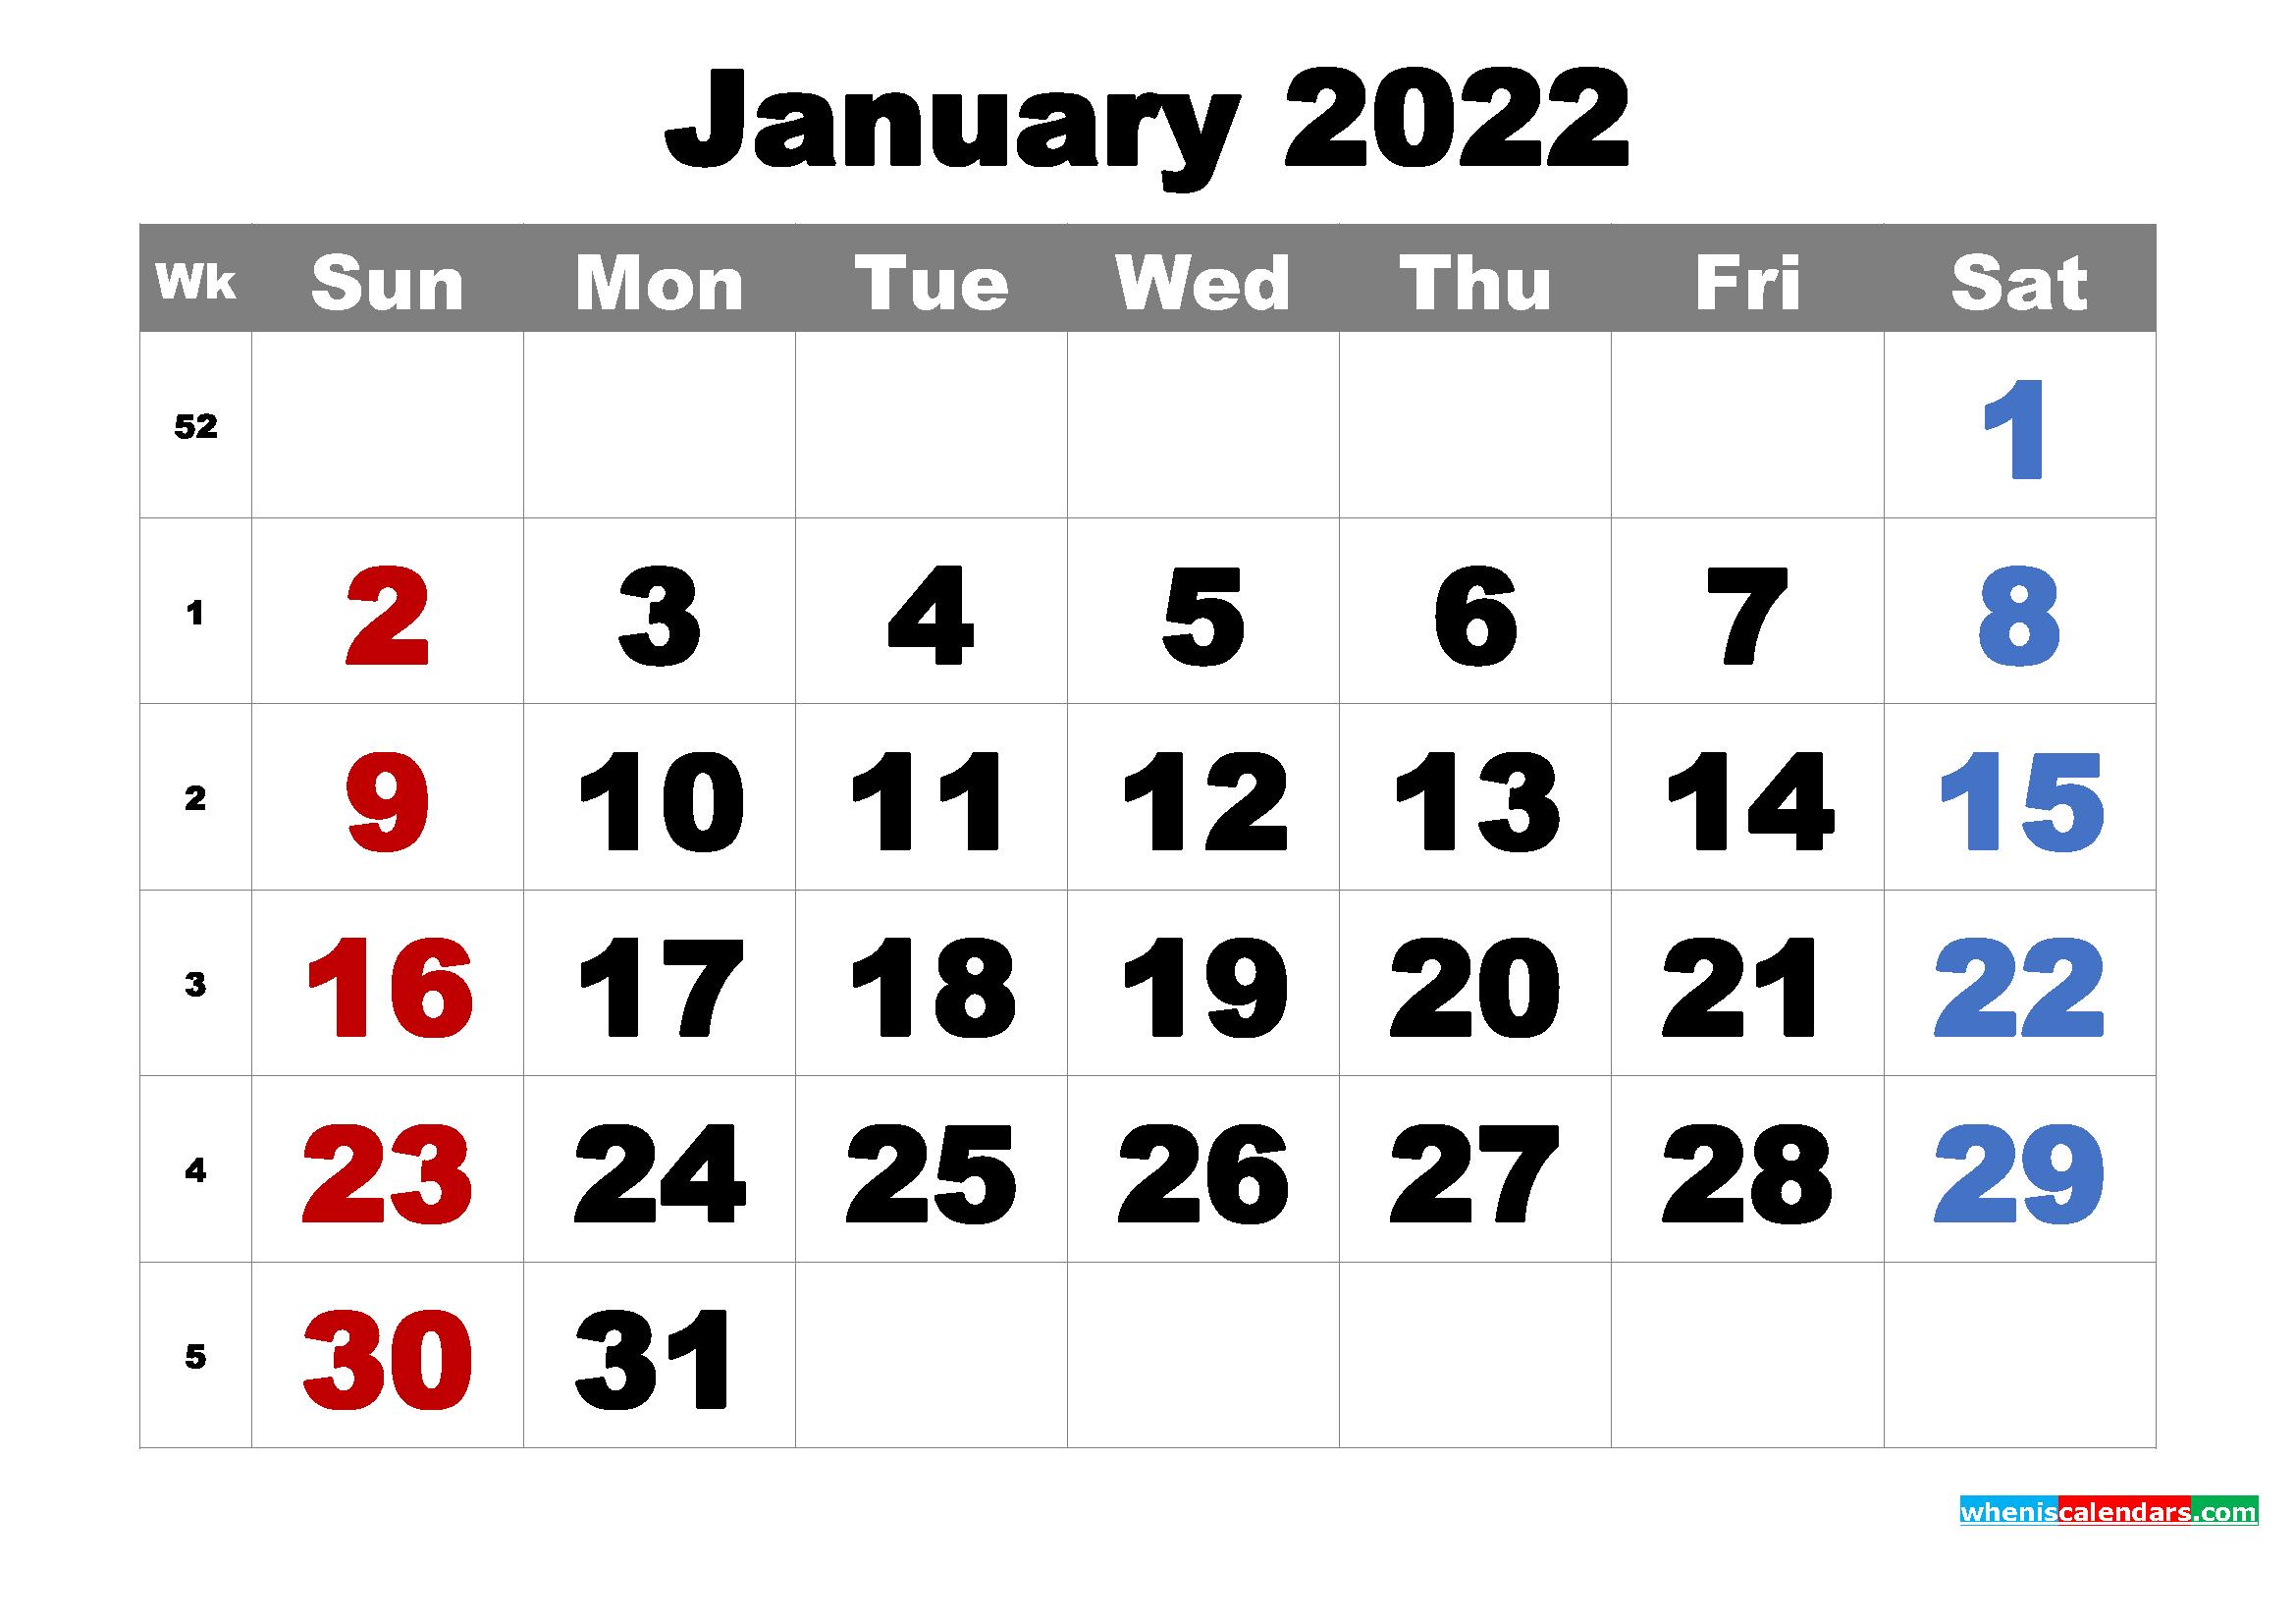 Free Printable January 2022 Calendar Word, Pdf, Image inside January Calendar 2022 Printable